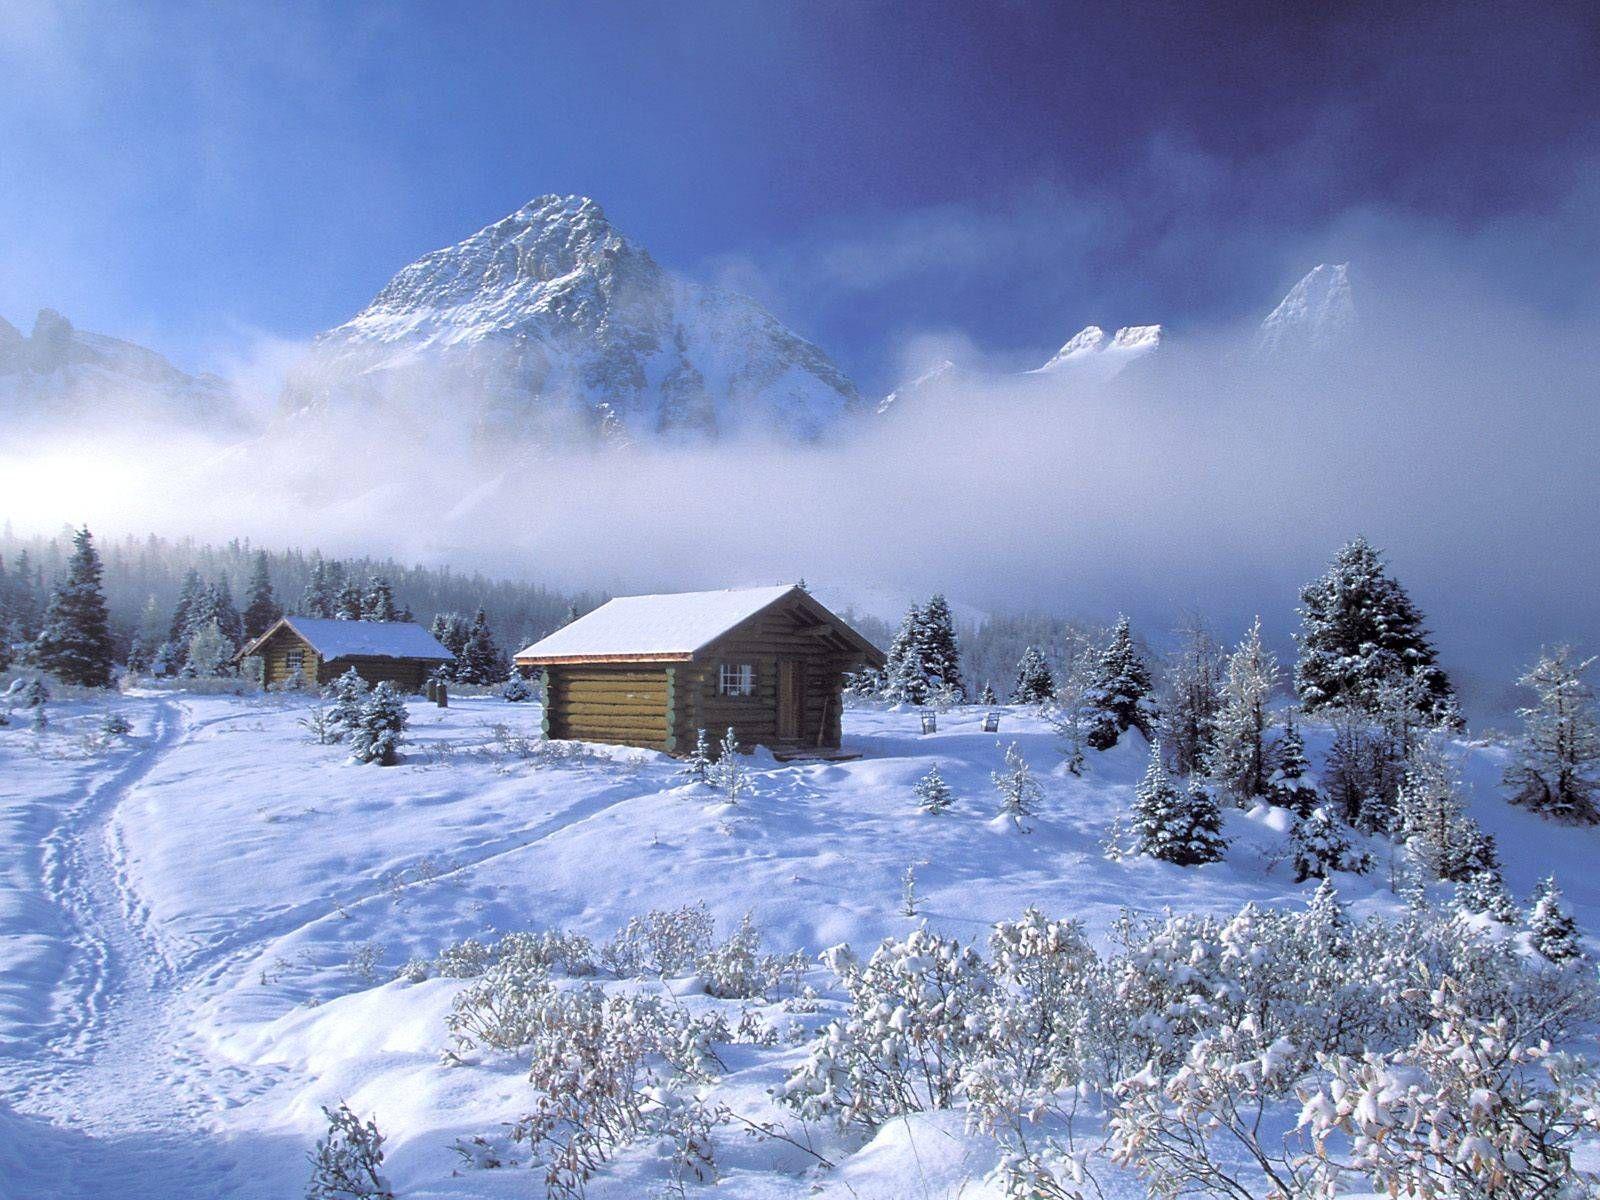 Christmas Mountain Scenes Beautiful Christmas Desktop Resources Facebook Landscape Mountain Romantic Cabin Mountain Cottage Winter Scenery